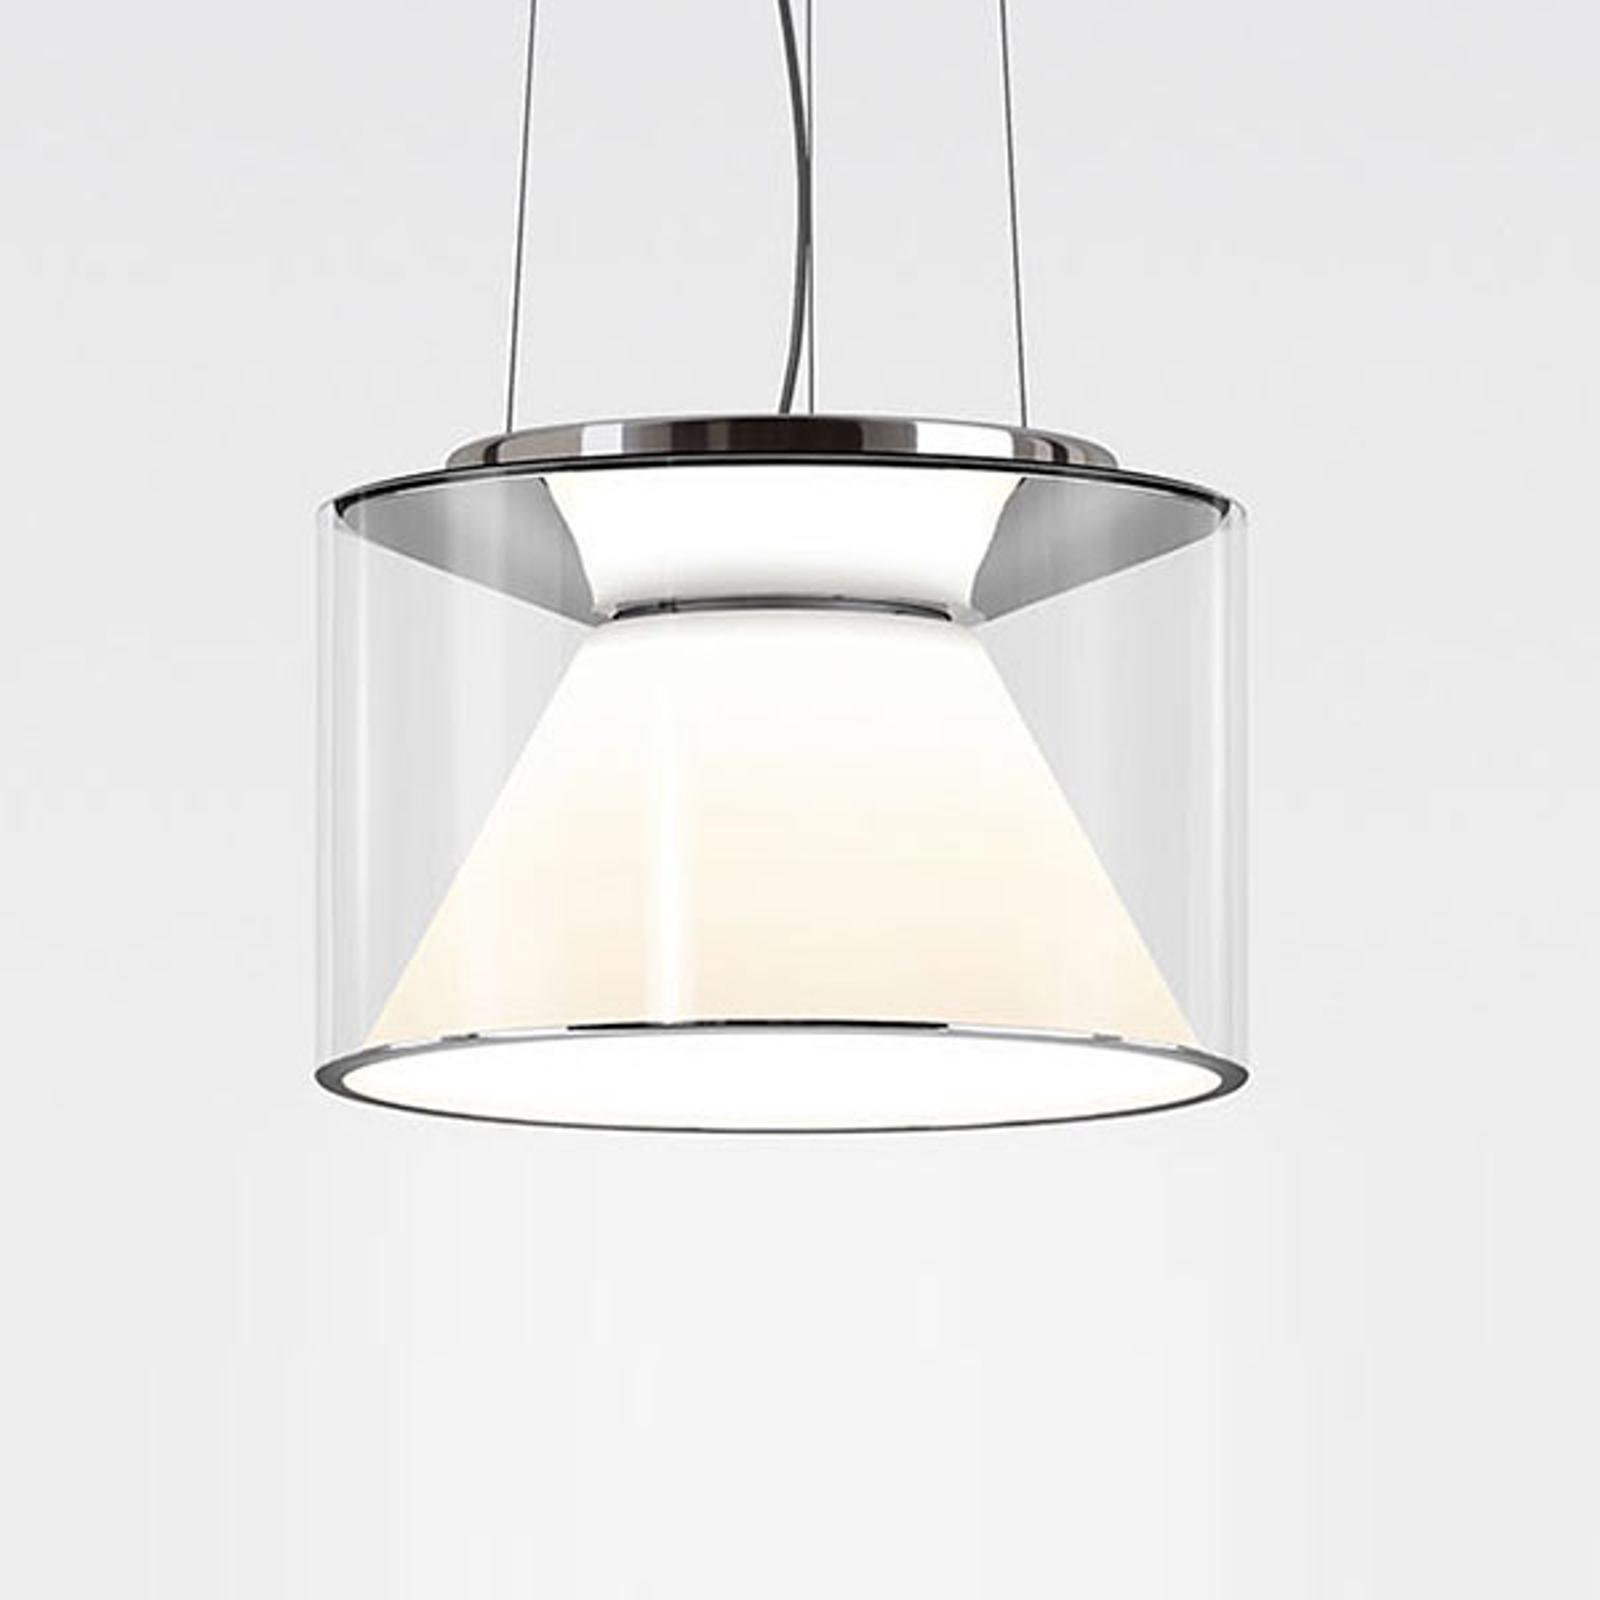 serien.lighting Drum M pendel wire 927 Triac, flad